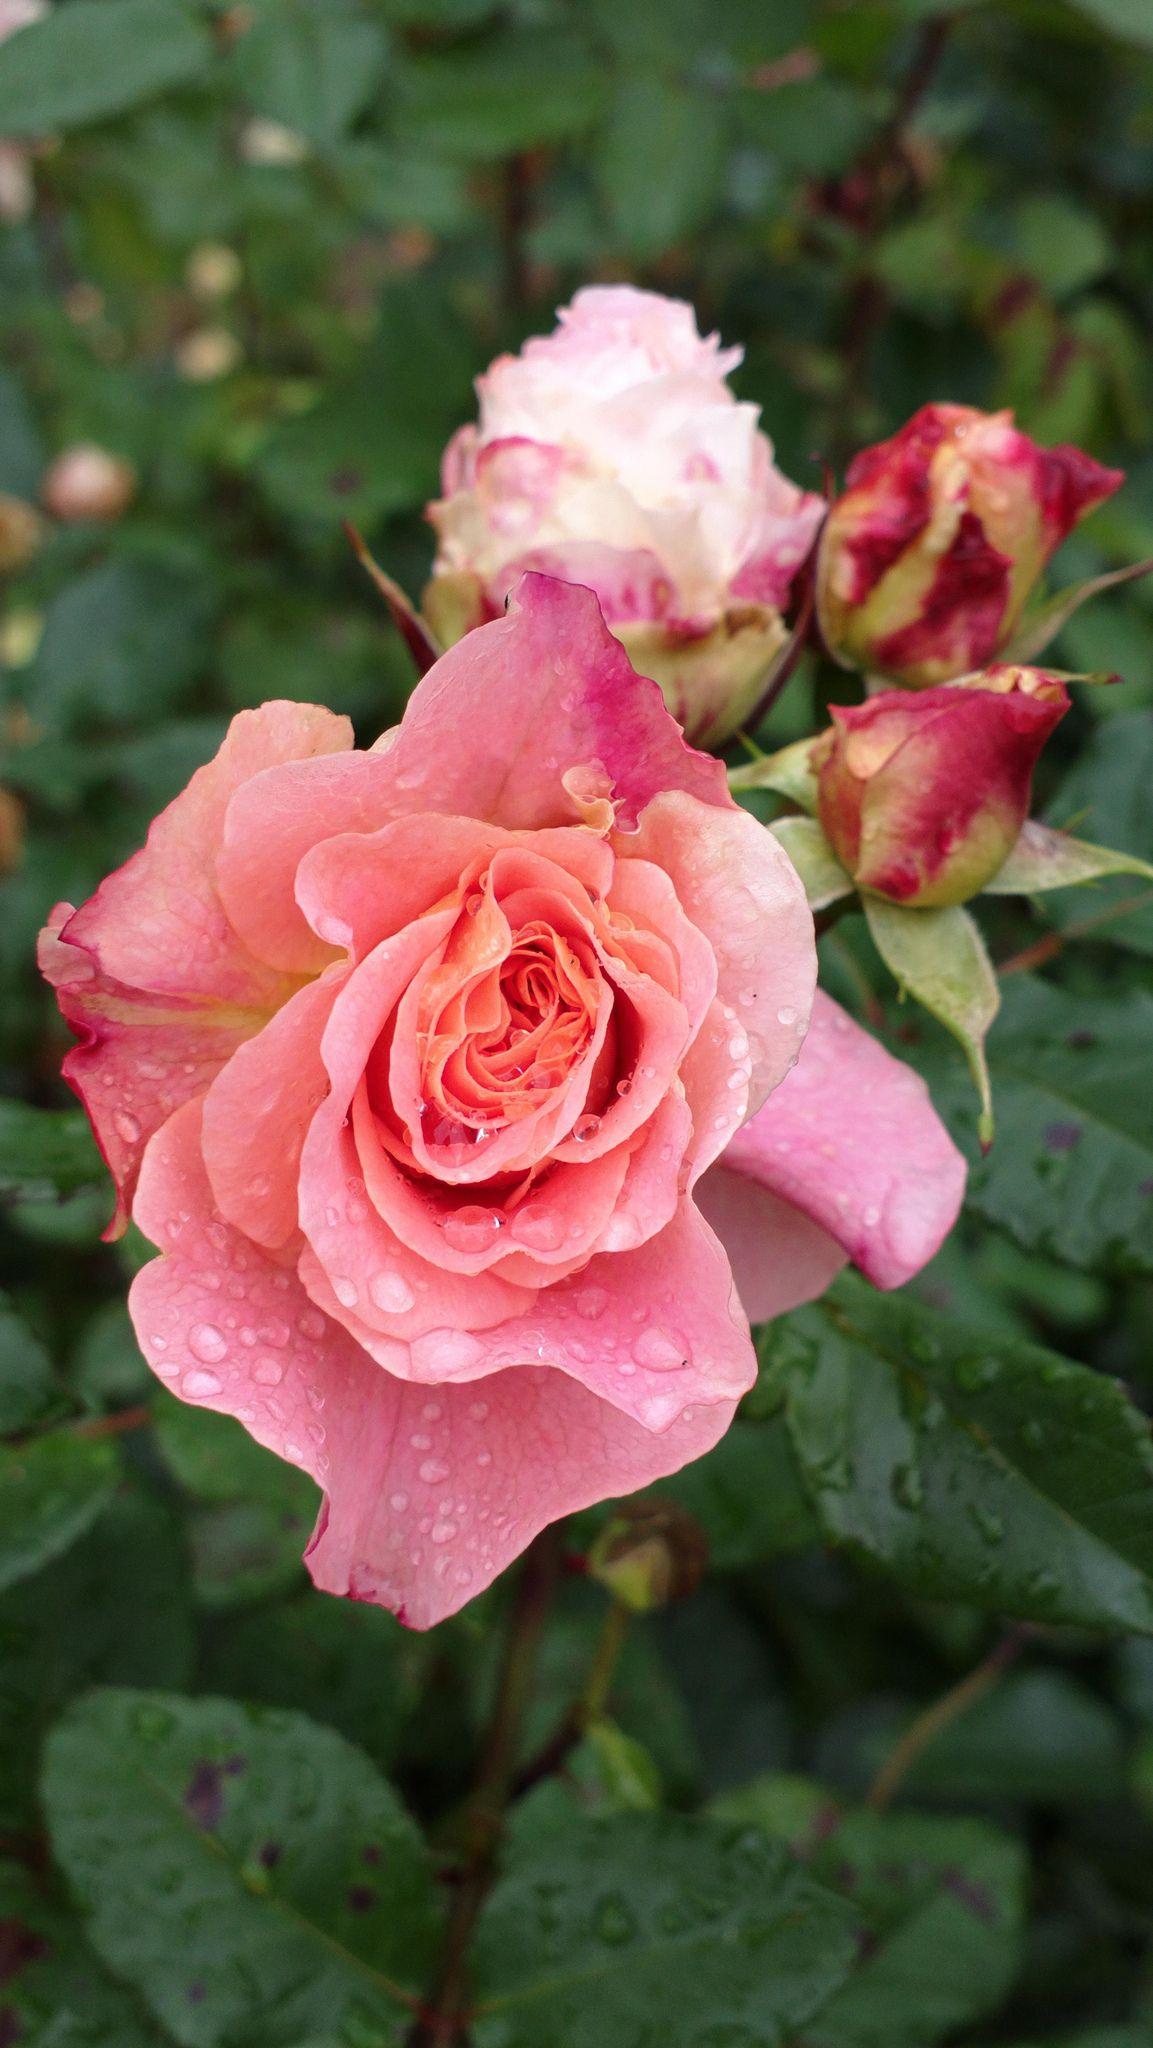 'Augusta Luise' | Hybrid Tea Rose. Hans Jürgen Evers (Germany, 1999) | Flickr - © KamalaKala